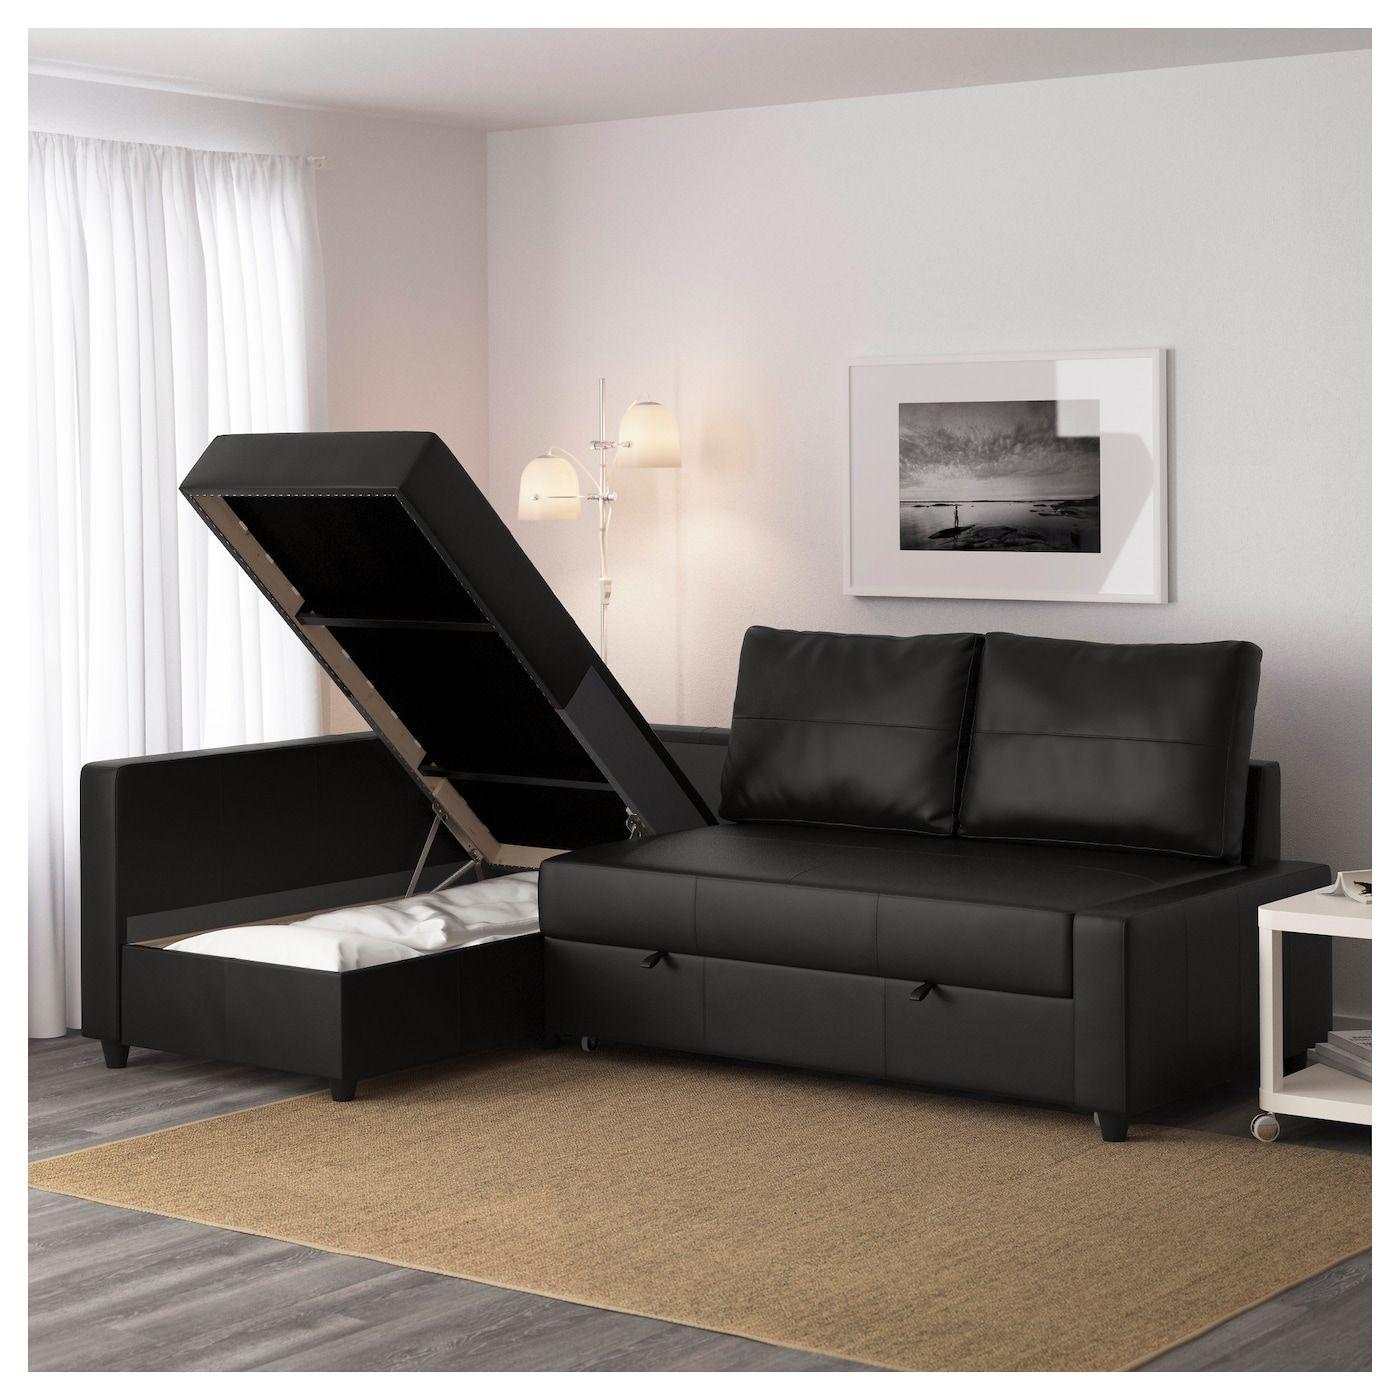 Friheten Sleeper Sectional 3 Seat W Storage Skiftebo Dark Gray Ikea In 2020 Corner Sofa Bed With Storage Sofa Bed With Chaise Corner Sofa With Storage